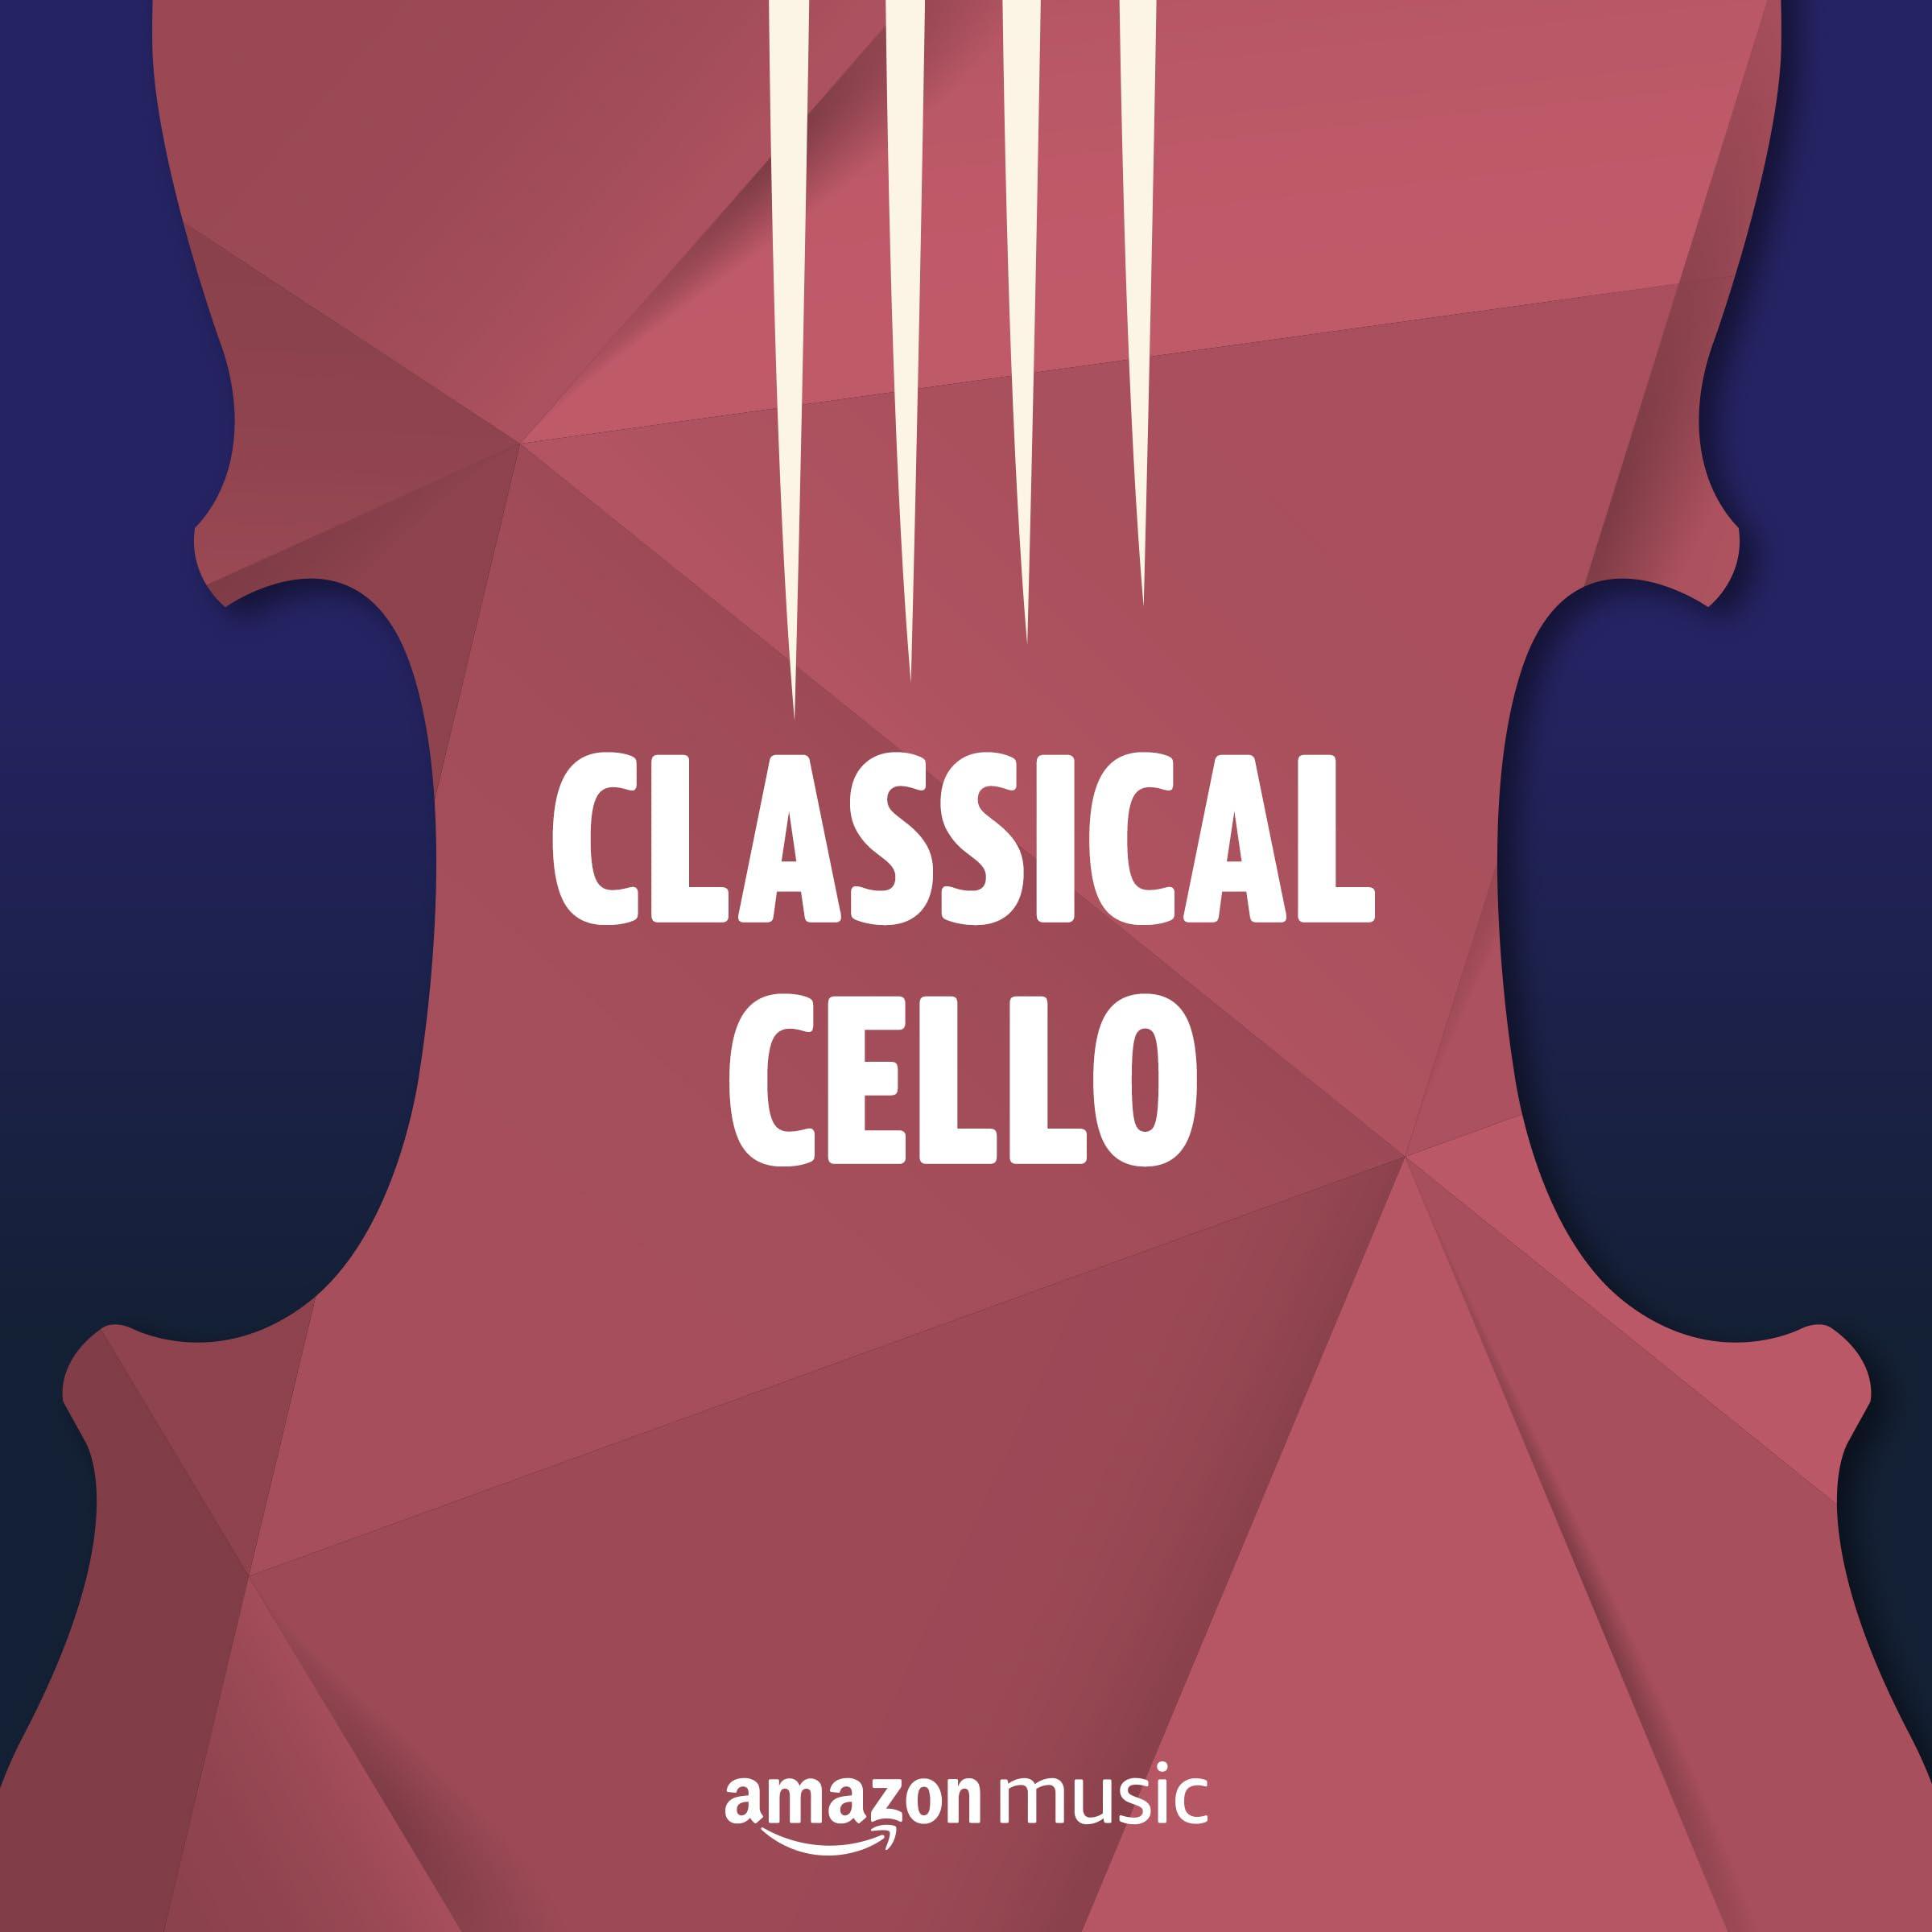 Classical Cello